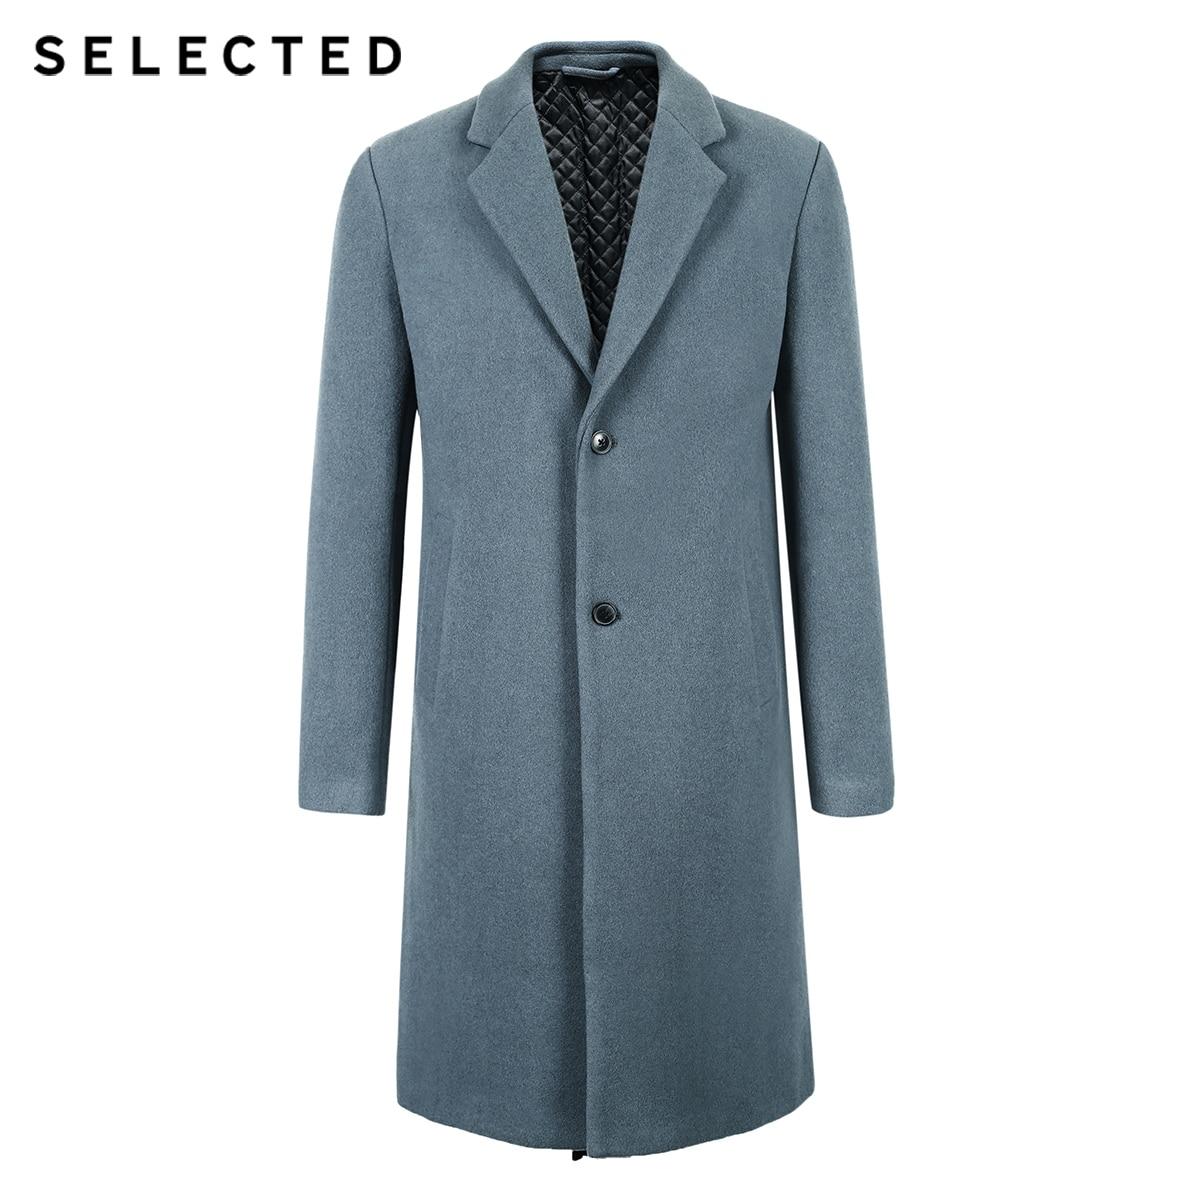 SELECTED Men's Winter Wool-blend Coat Cashmere Jacket Medium Style Woolen Clothes S | 418427551